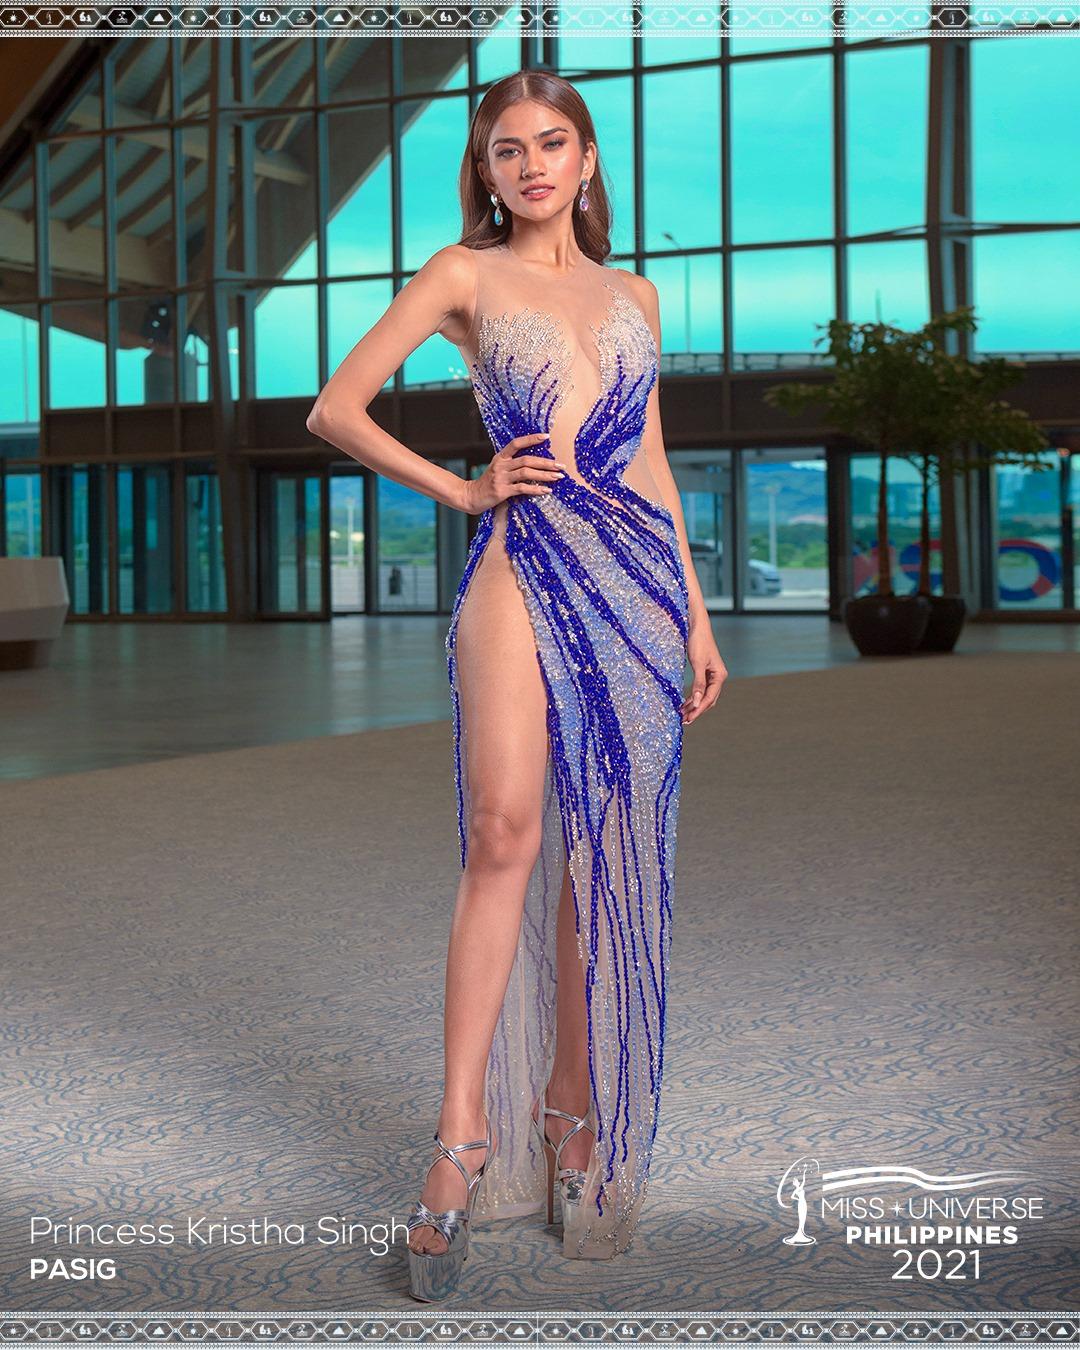 princess-kristha-singh-miss-universe-evening-gown-2021